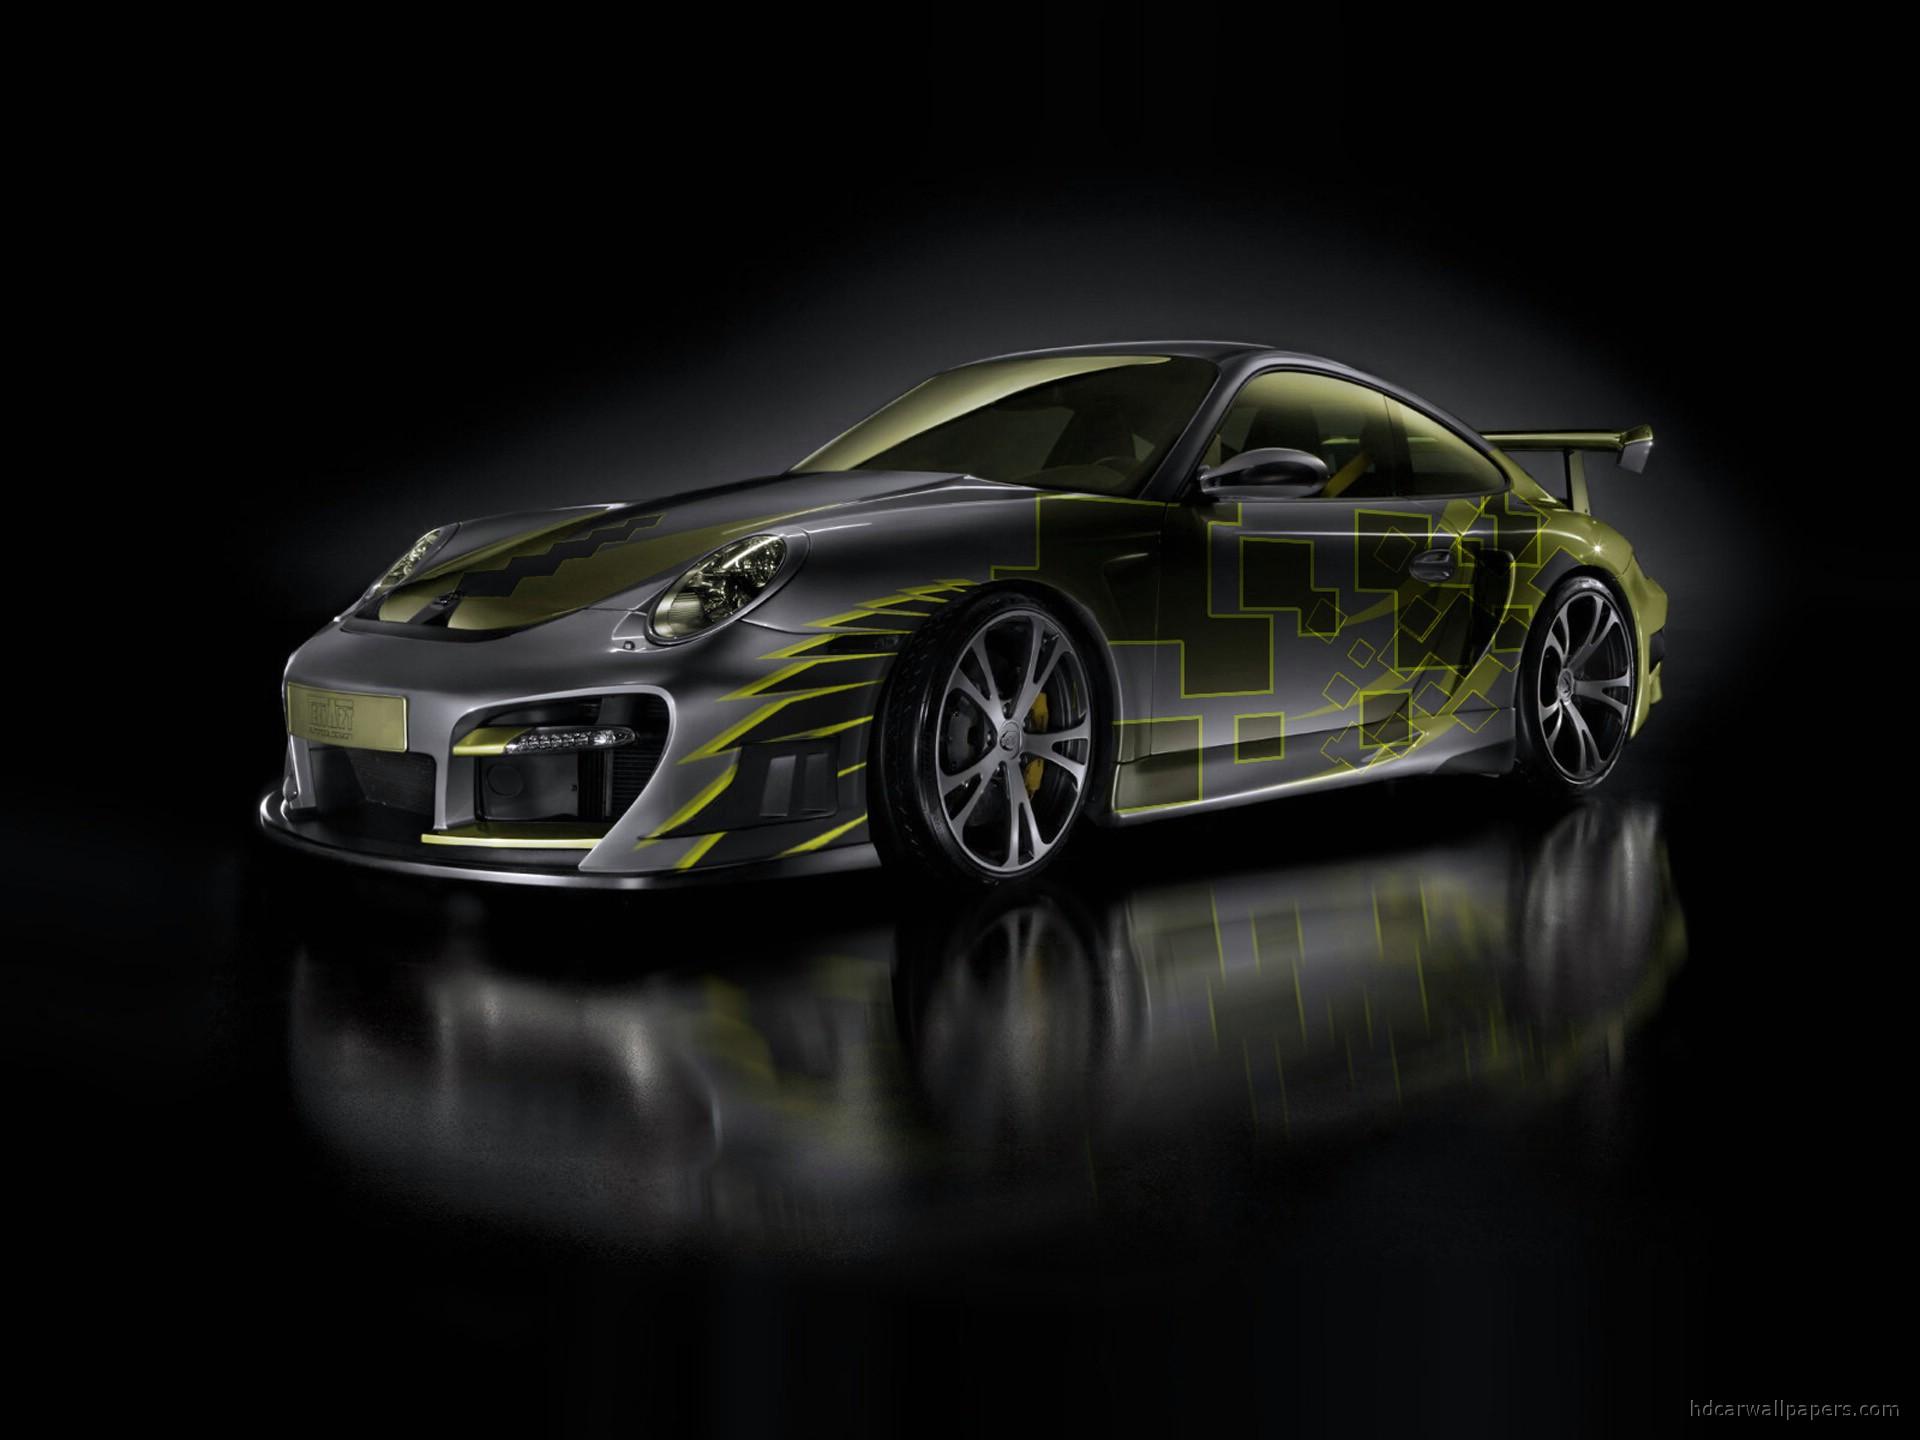 Techart Porsche 911 Turbo Exclusive HD    HD Wallpaper